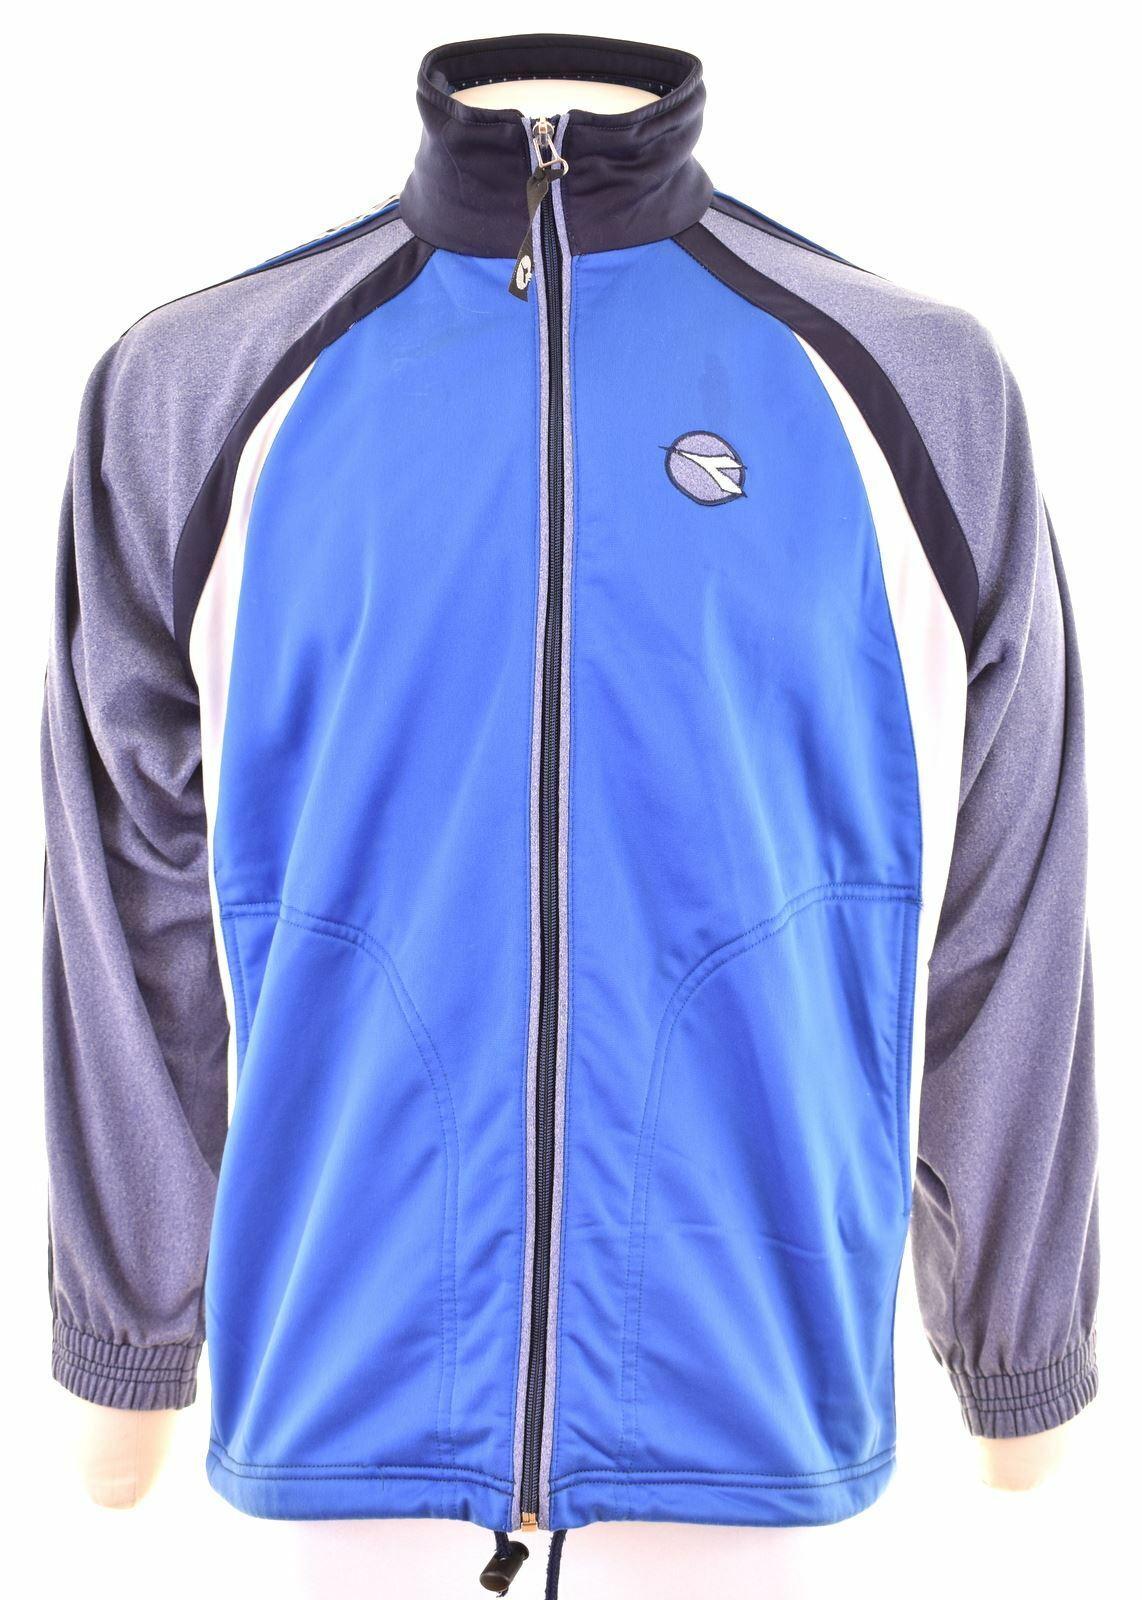 DIADORA Mens Tracksuit Top Jacket UK 34 XS Blue Polyester Vintage DV01